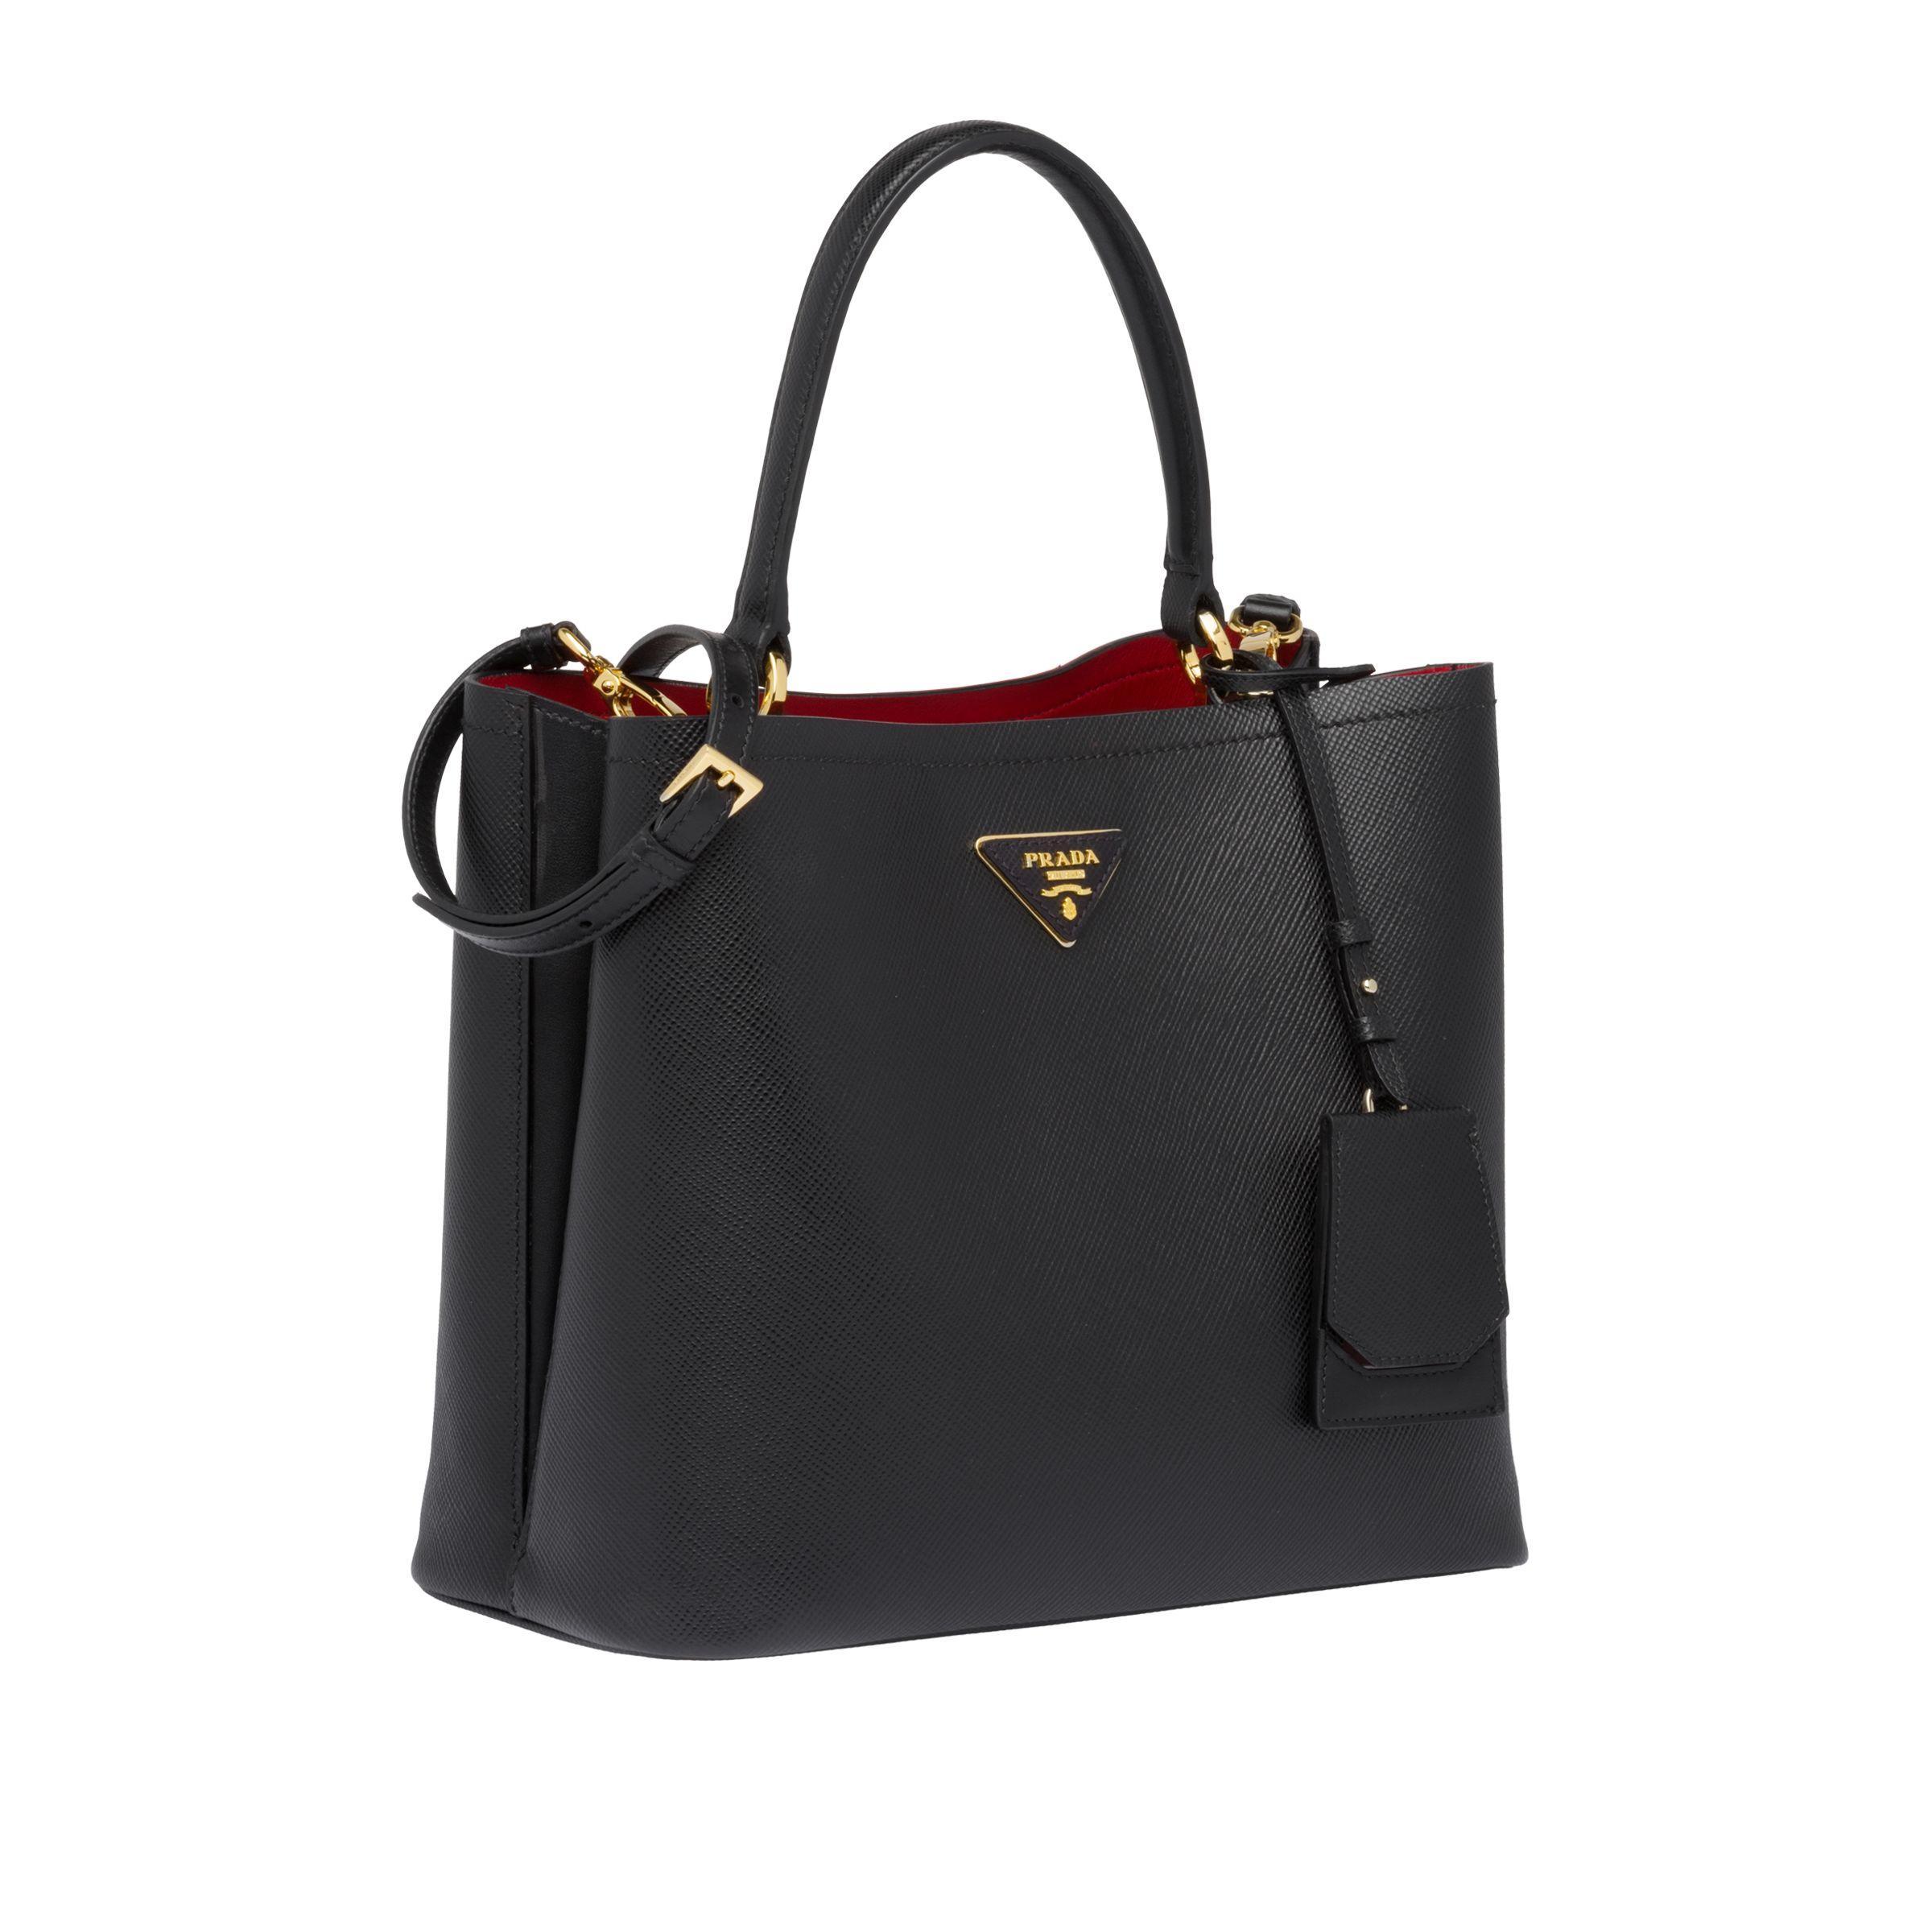 Prada Panier Saffiano Leather Bag In